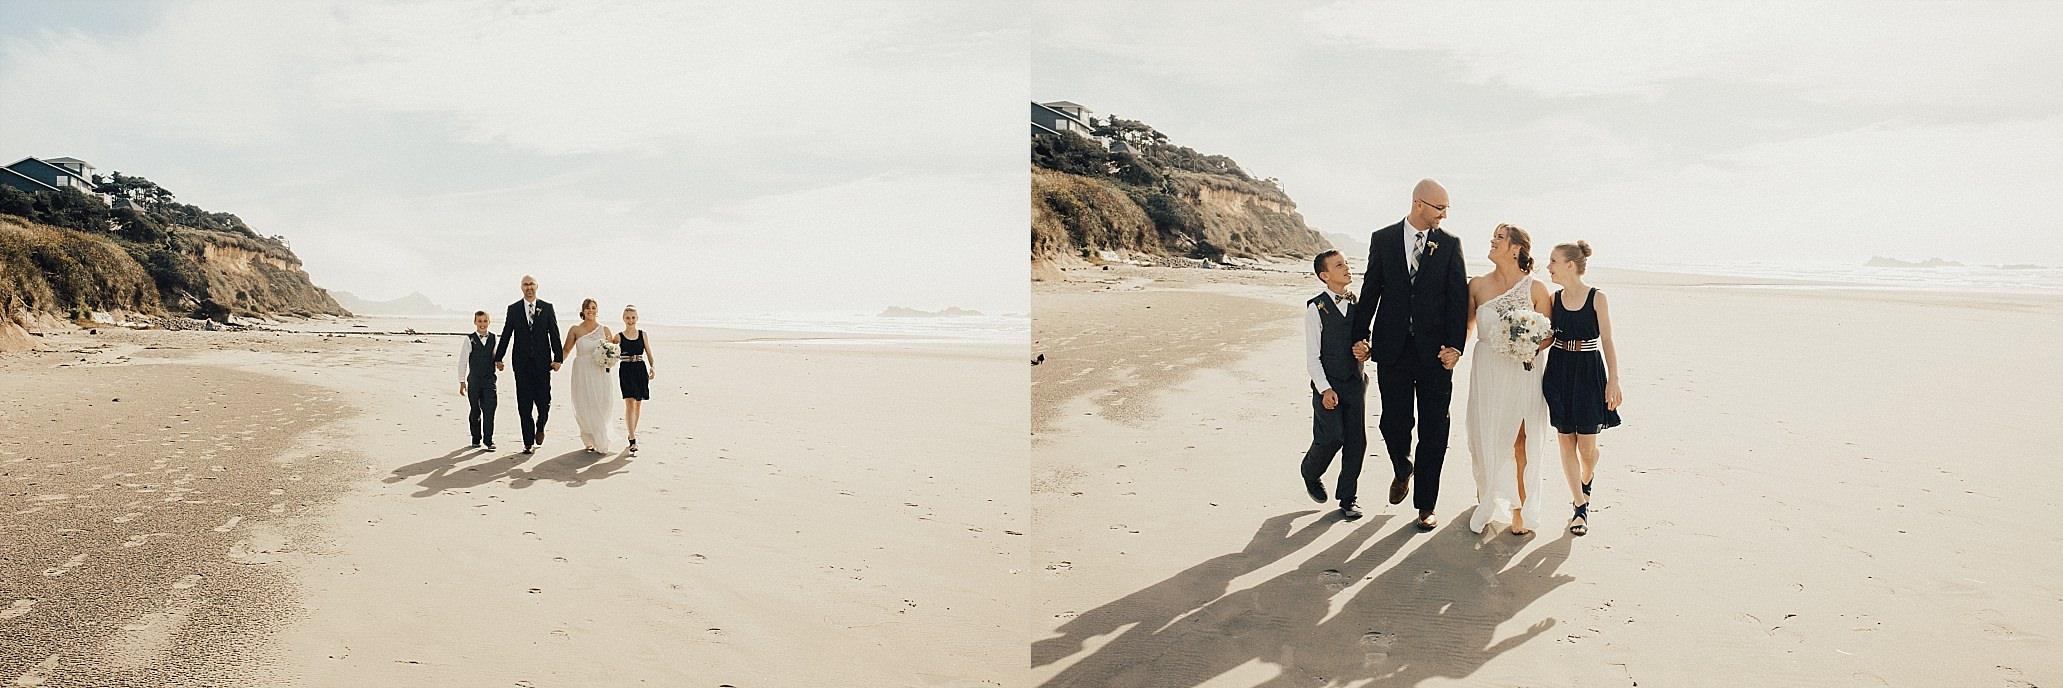 Oregon Coast Wedding Photographer (58).jpg